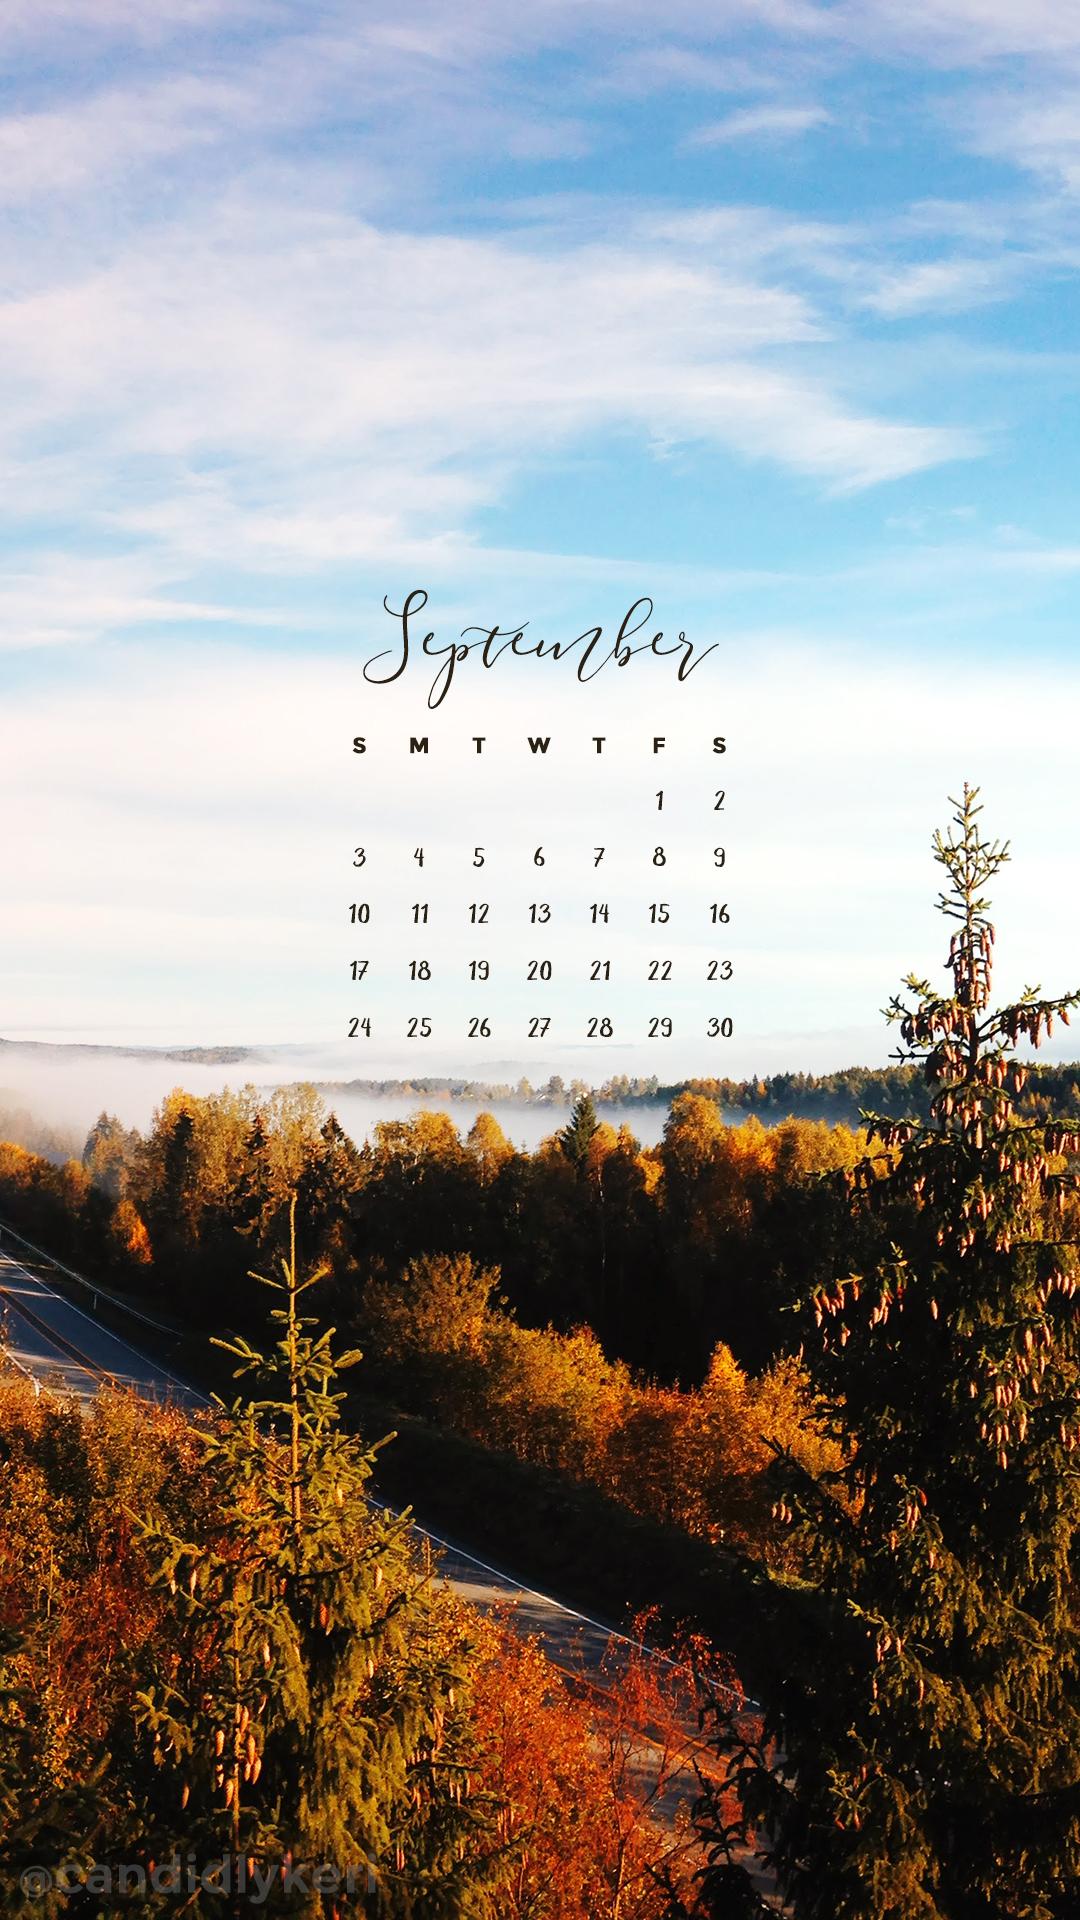 Iphone wallpaper the dress decoded - September Iphone Wallpaper